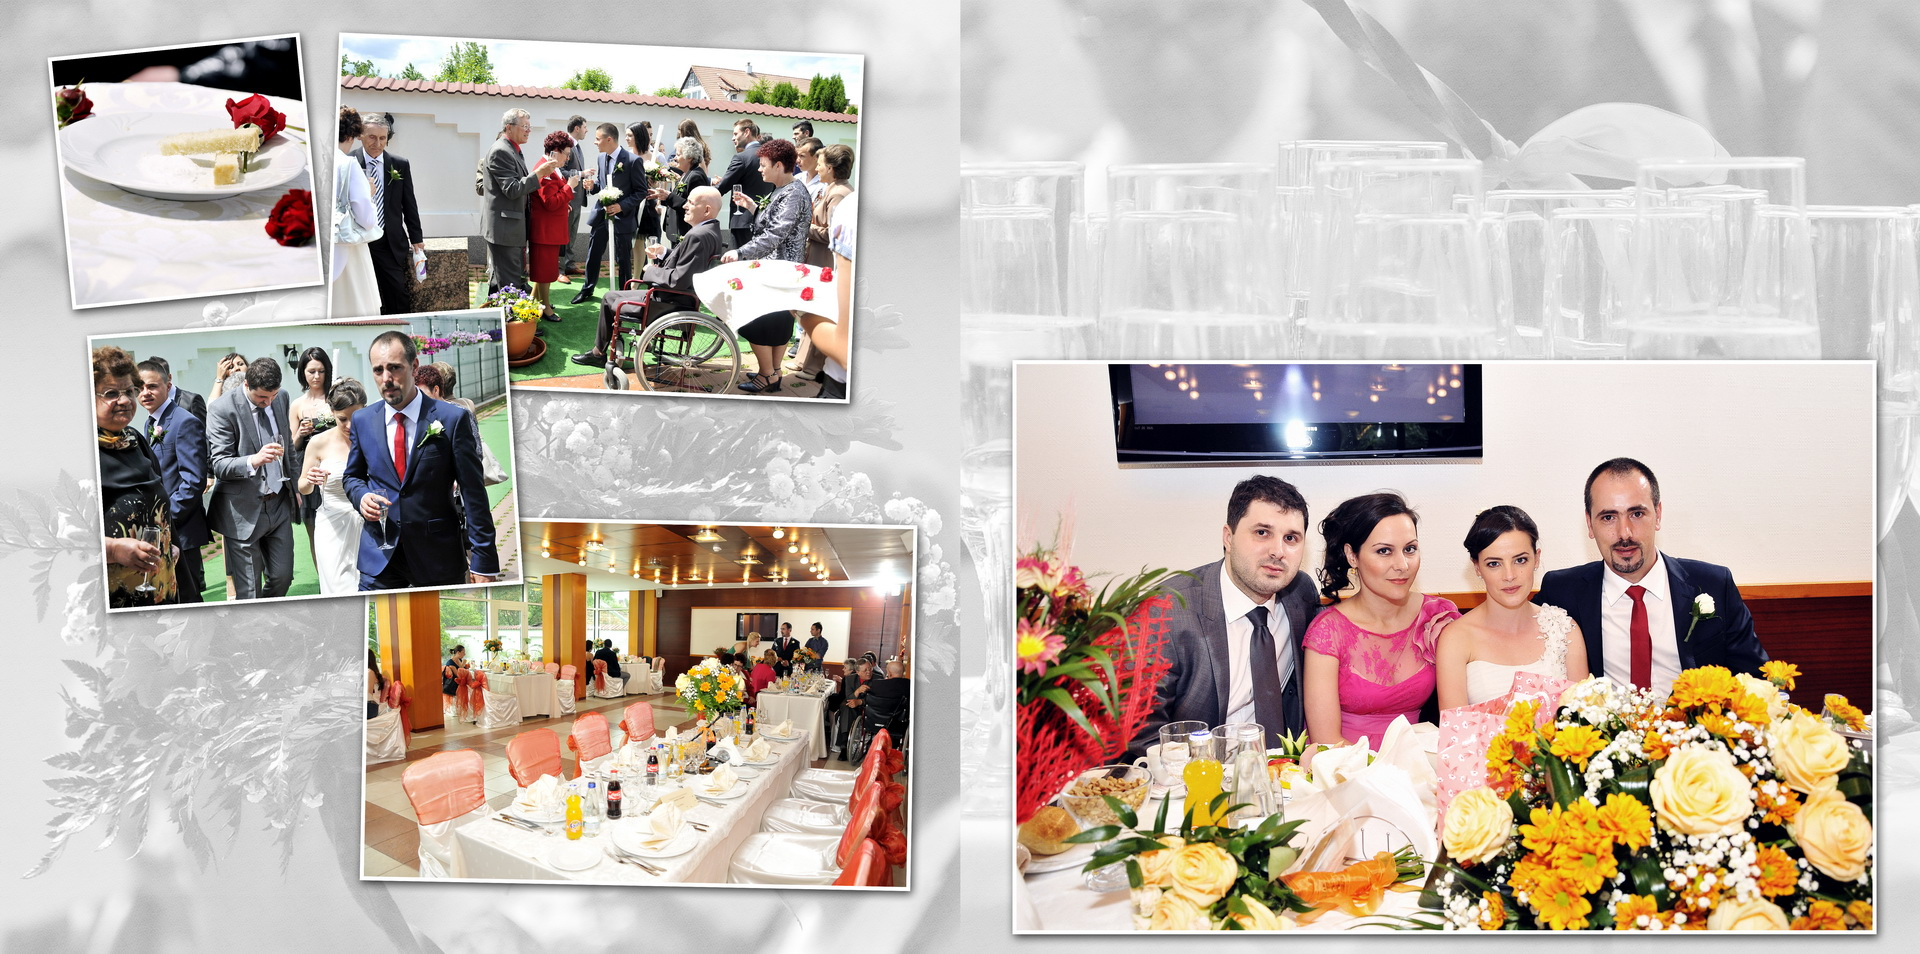 Nunta_25 mai 2013_BRASOV_AURAS&CAMELIA_17